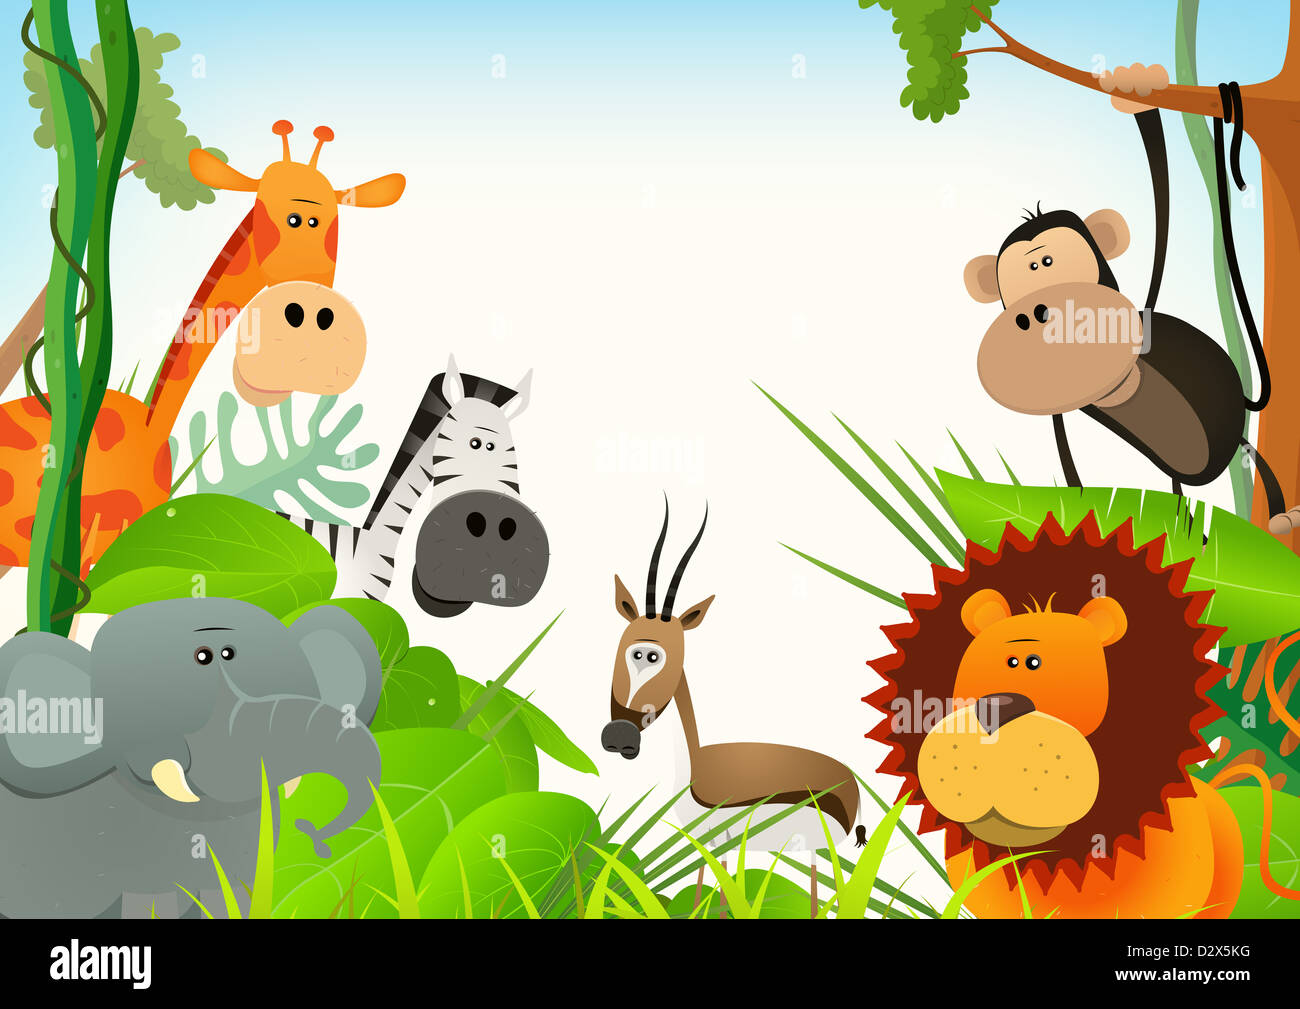 Fondos De Animales Animados: Illustration Of Cute Various Cartoon Wild Animals From